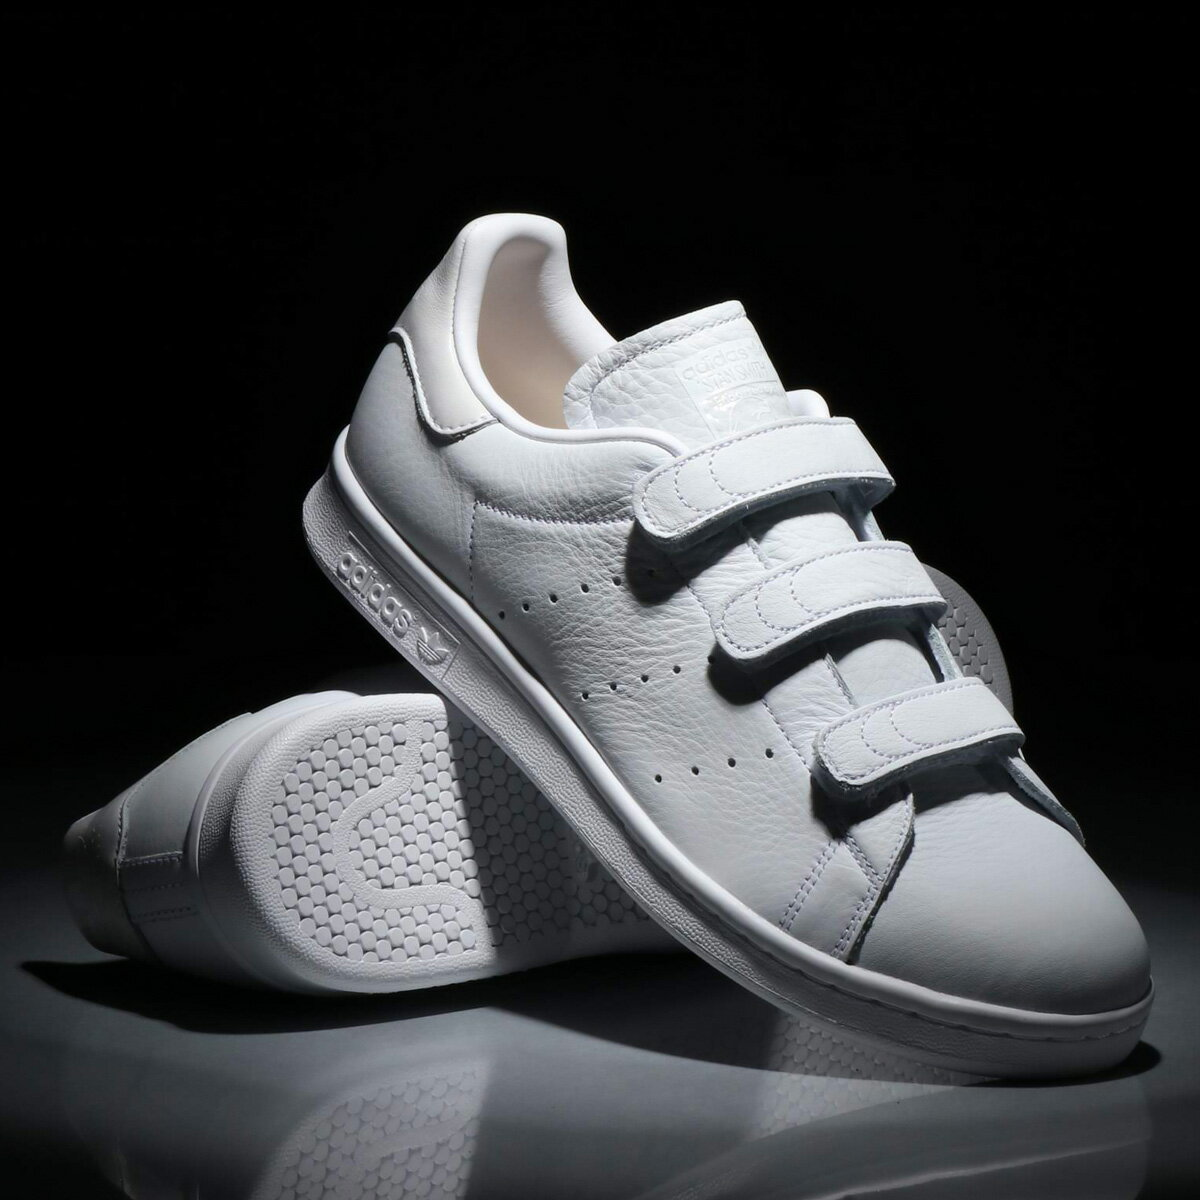 adidas Originals STAN SMITH CF(アディダス オリジナルス スタンスミス CF)Running White/Running White/Running White【メンズ レディース スニーカー】18SS-I